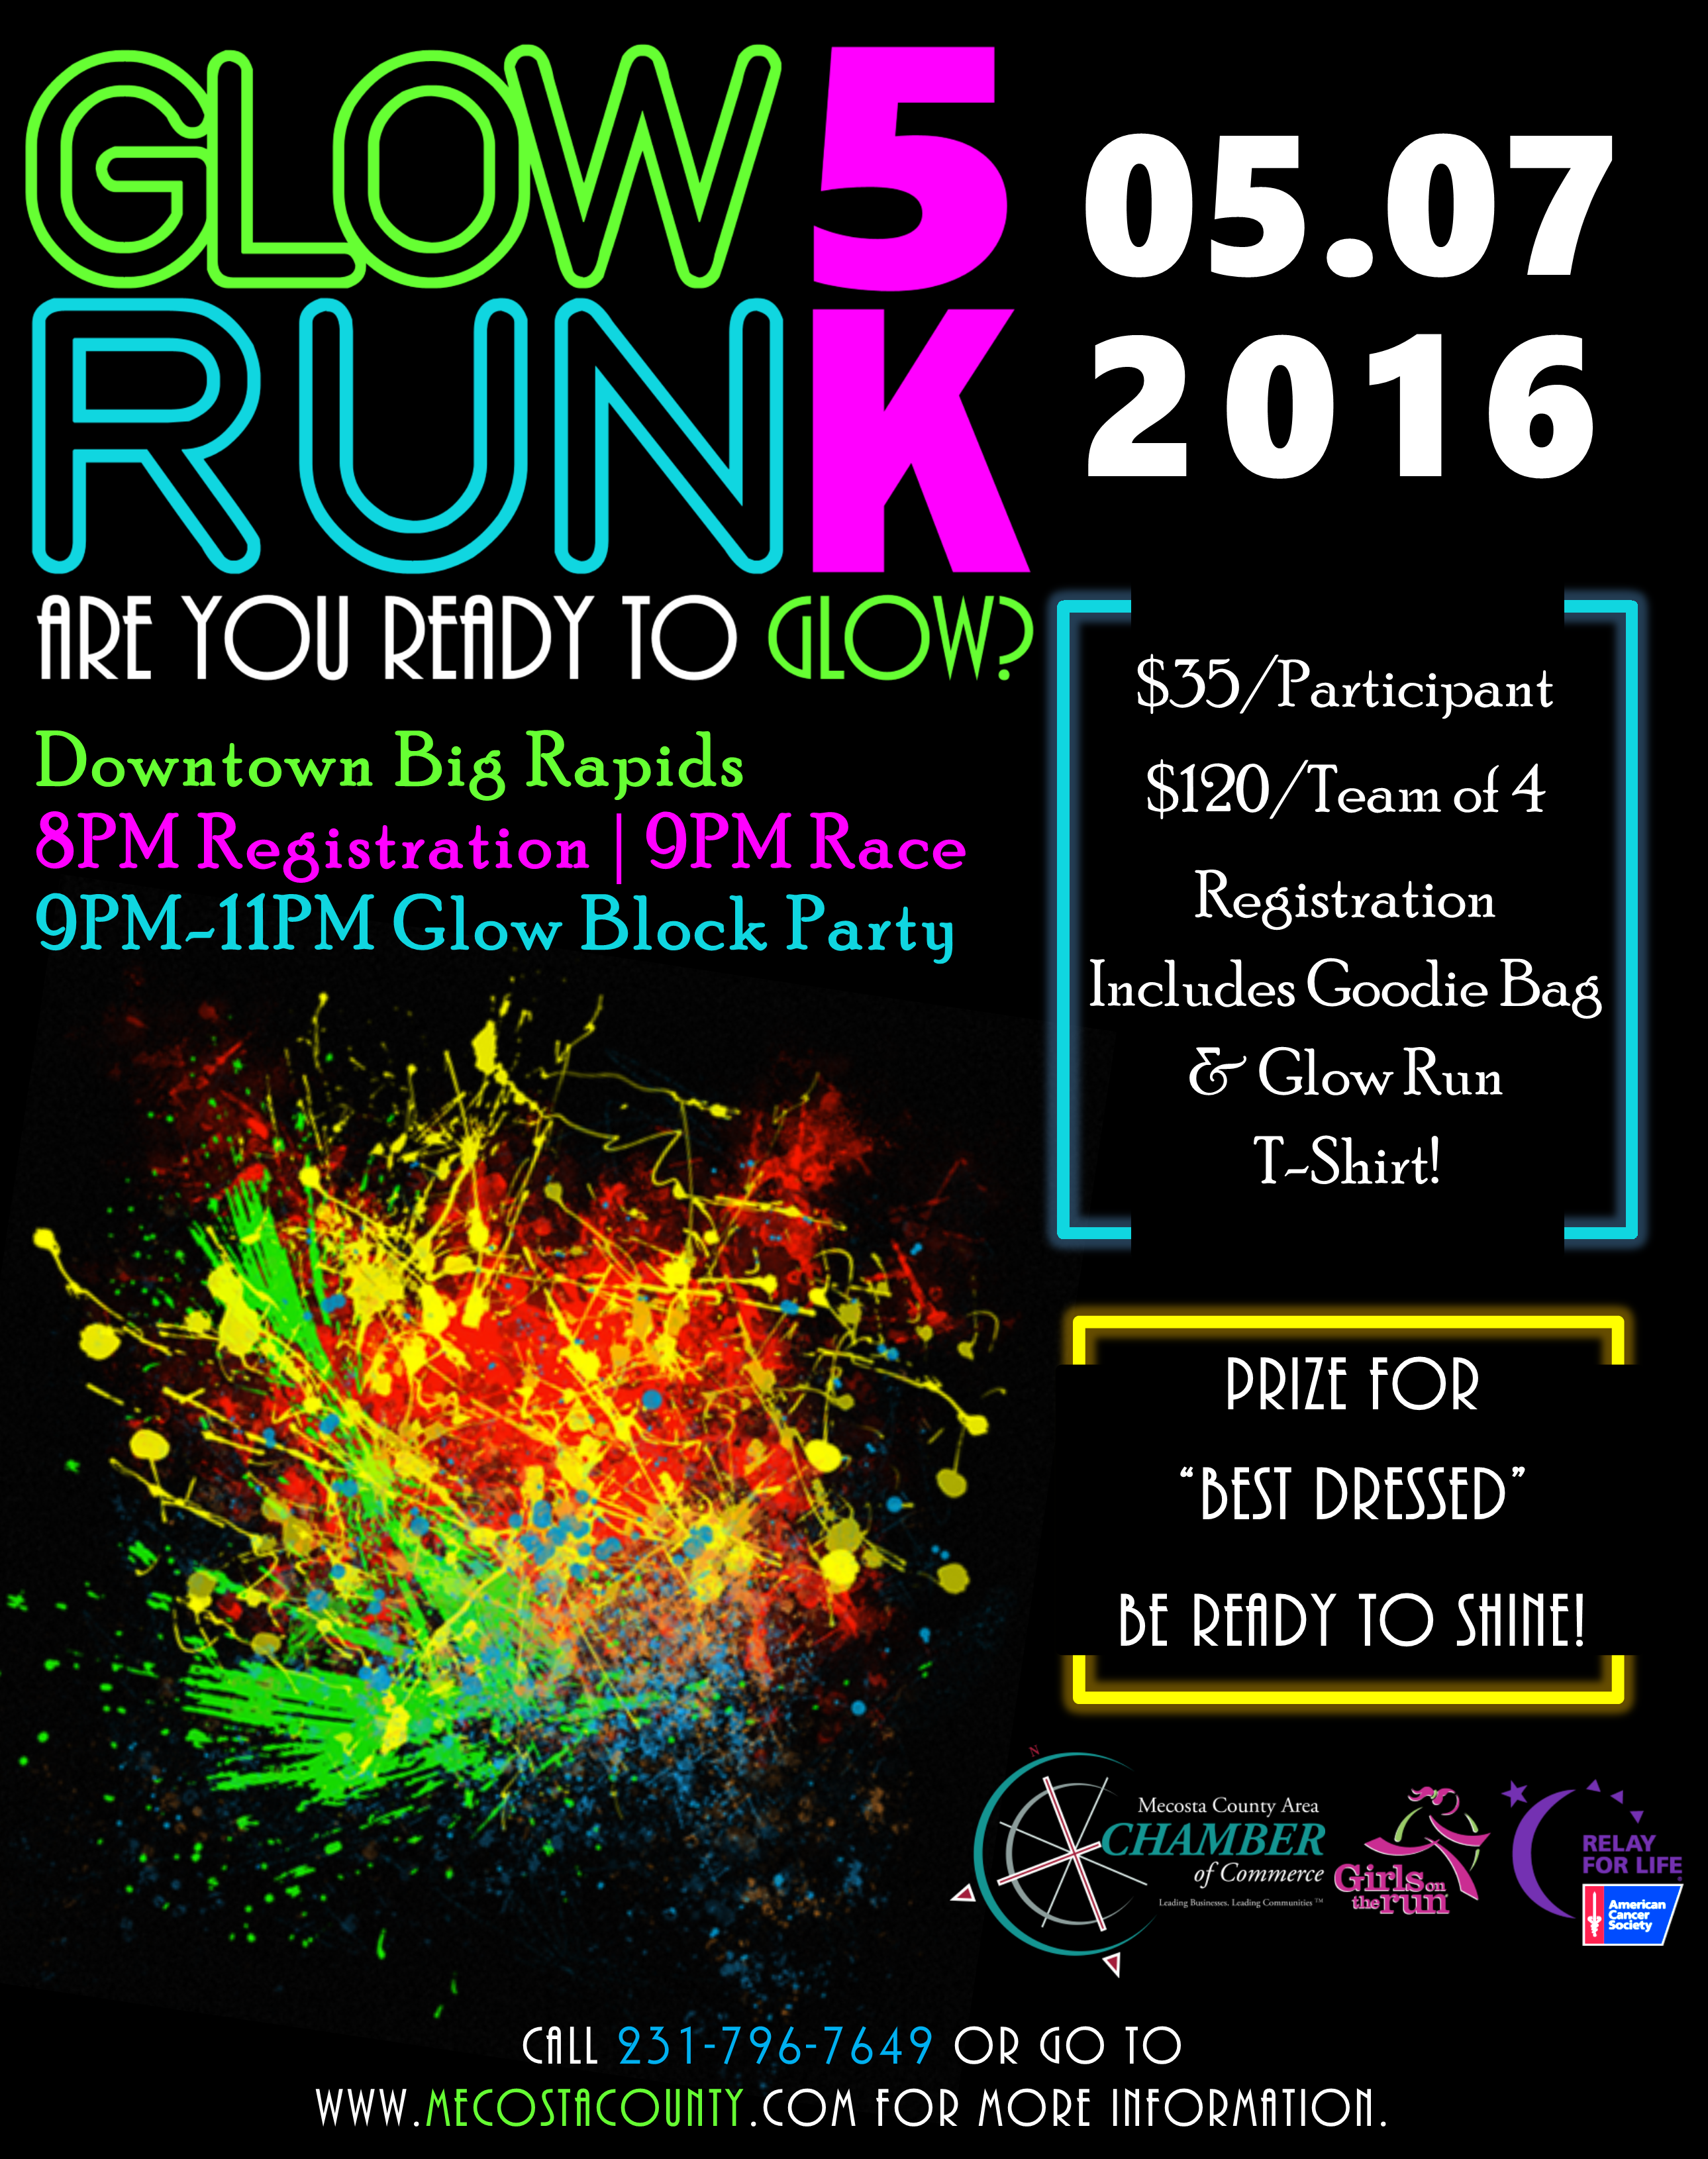 5k Glow Run Flyer Big Rapids Glow Run Pta Fundraising Walk Fundraiser